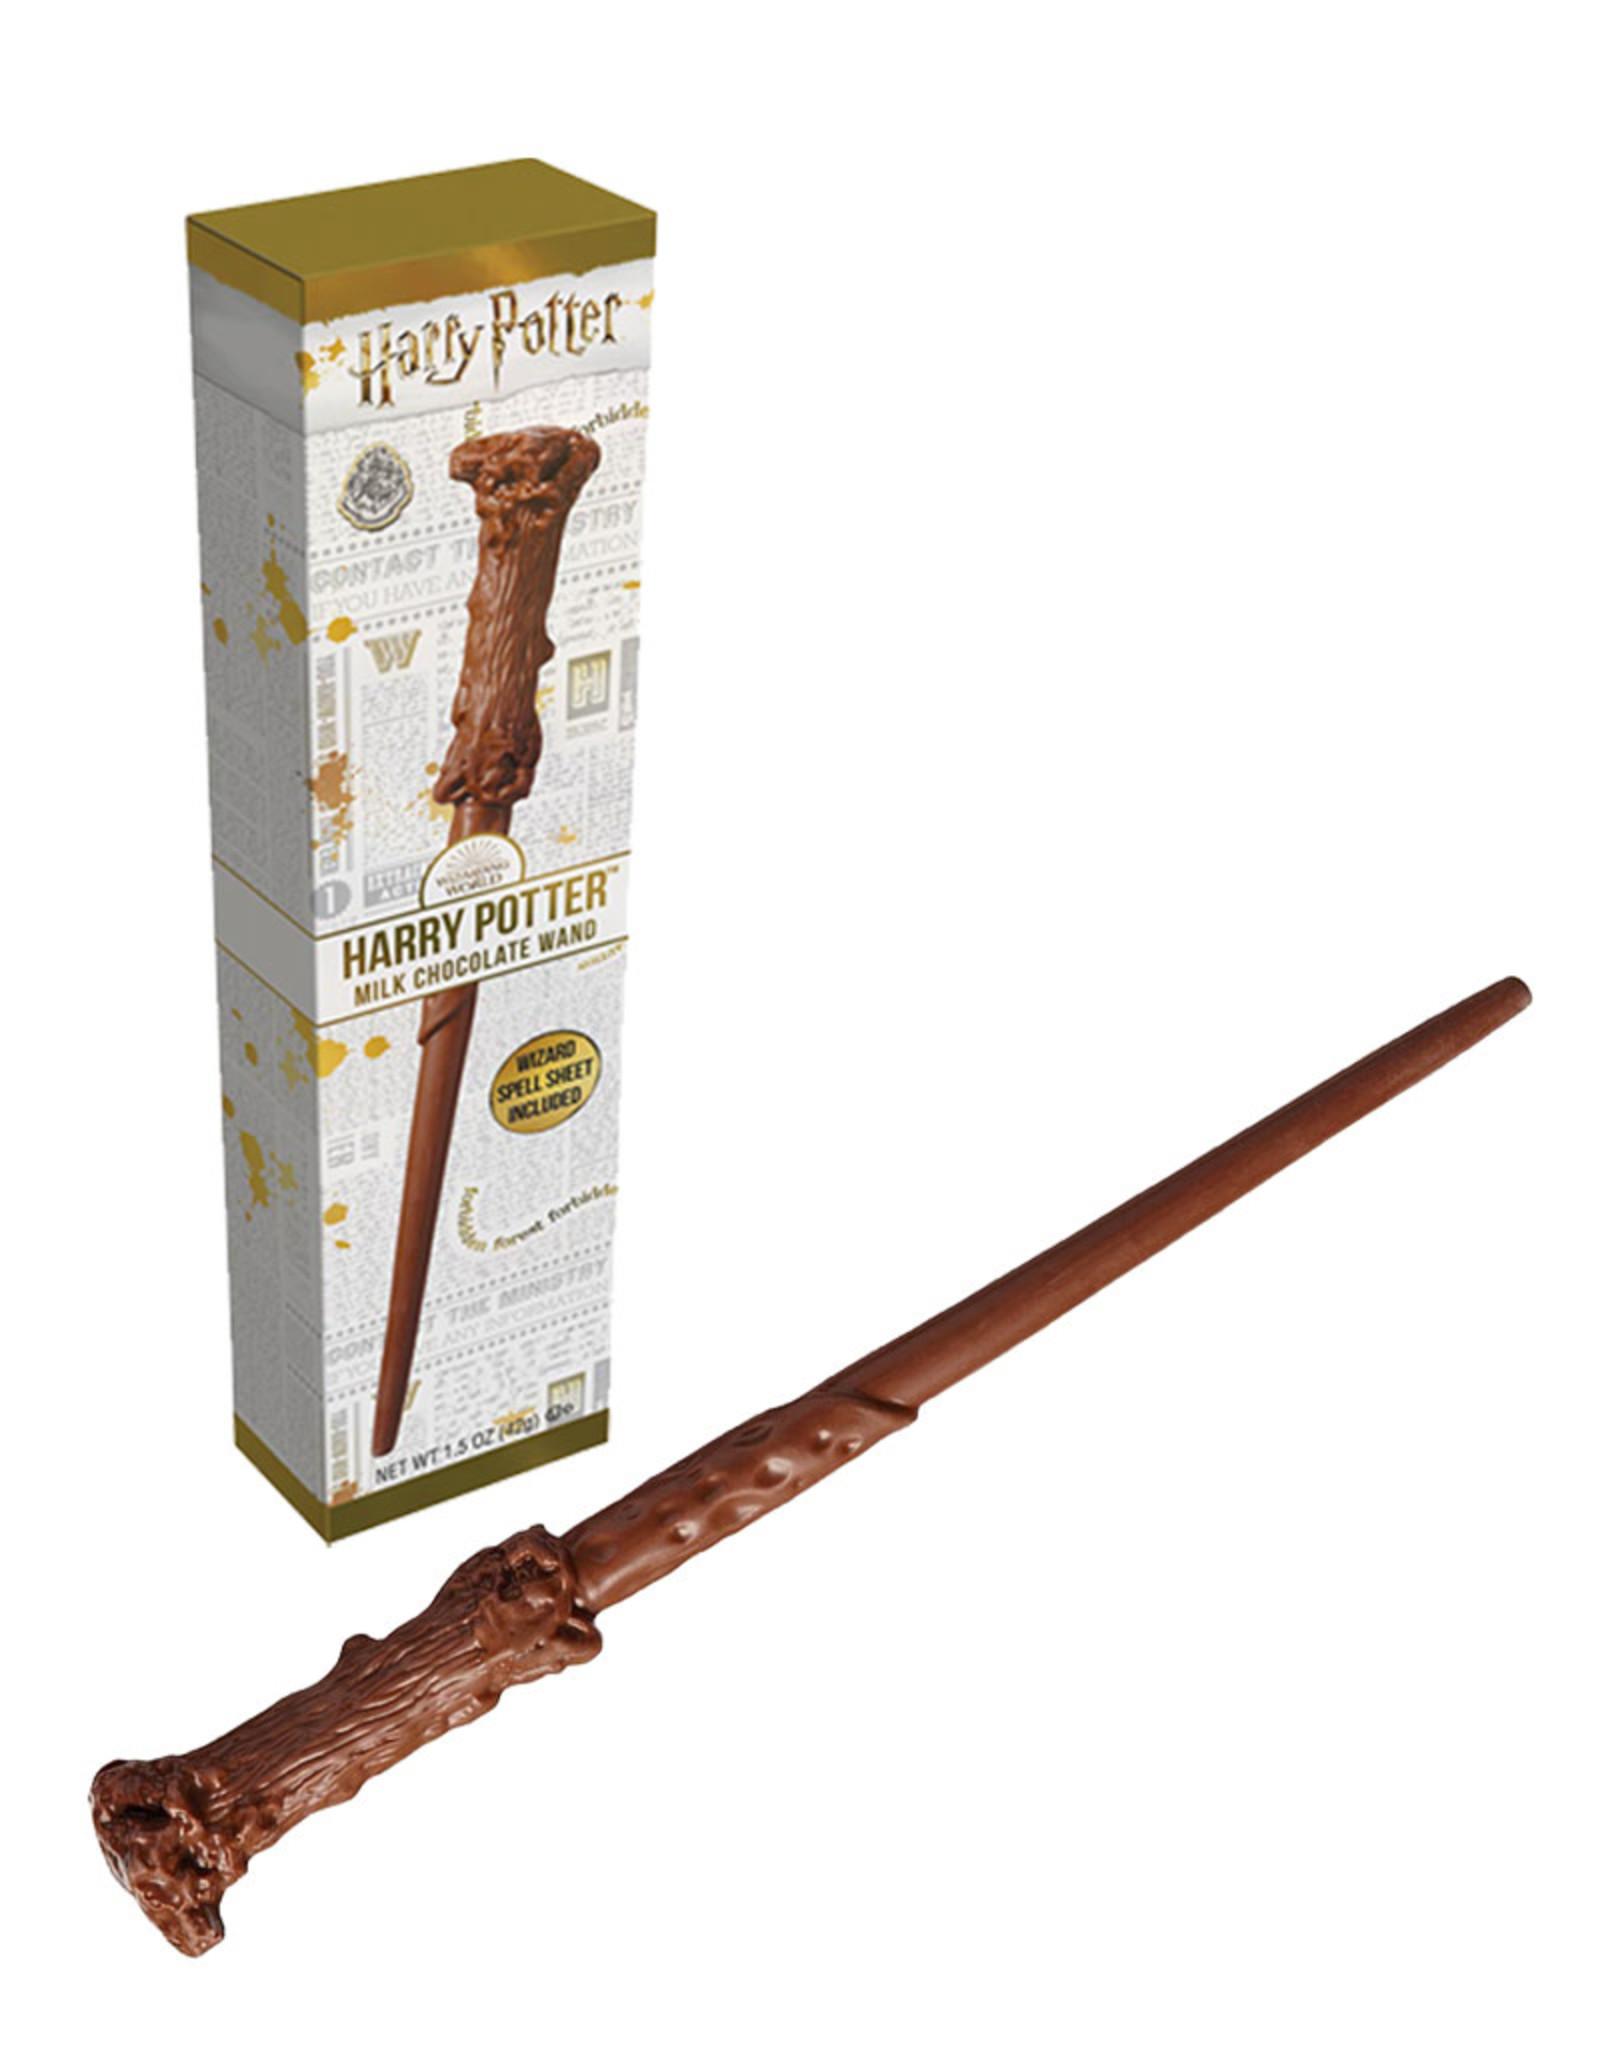 Harry Potter Harry Potter ( Chocolate Wand 42 g.  ) Harry Potter